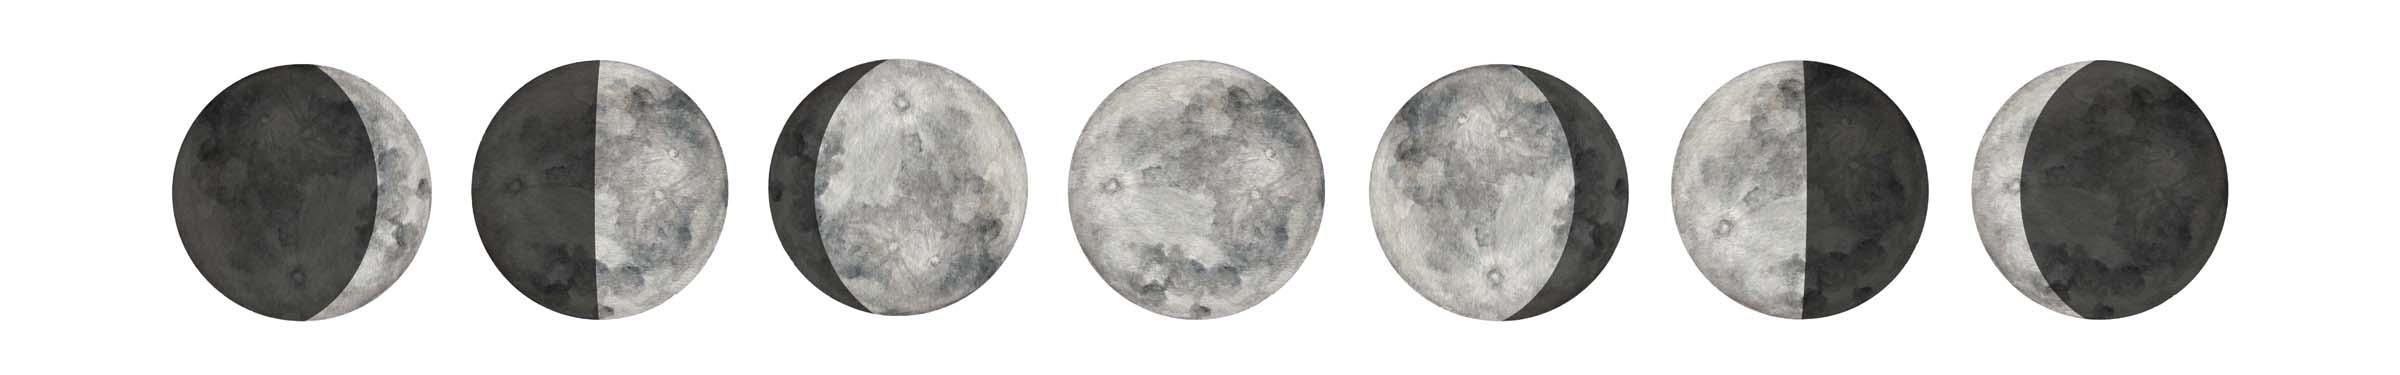 Moon Phases Clip Art.jpg